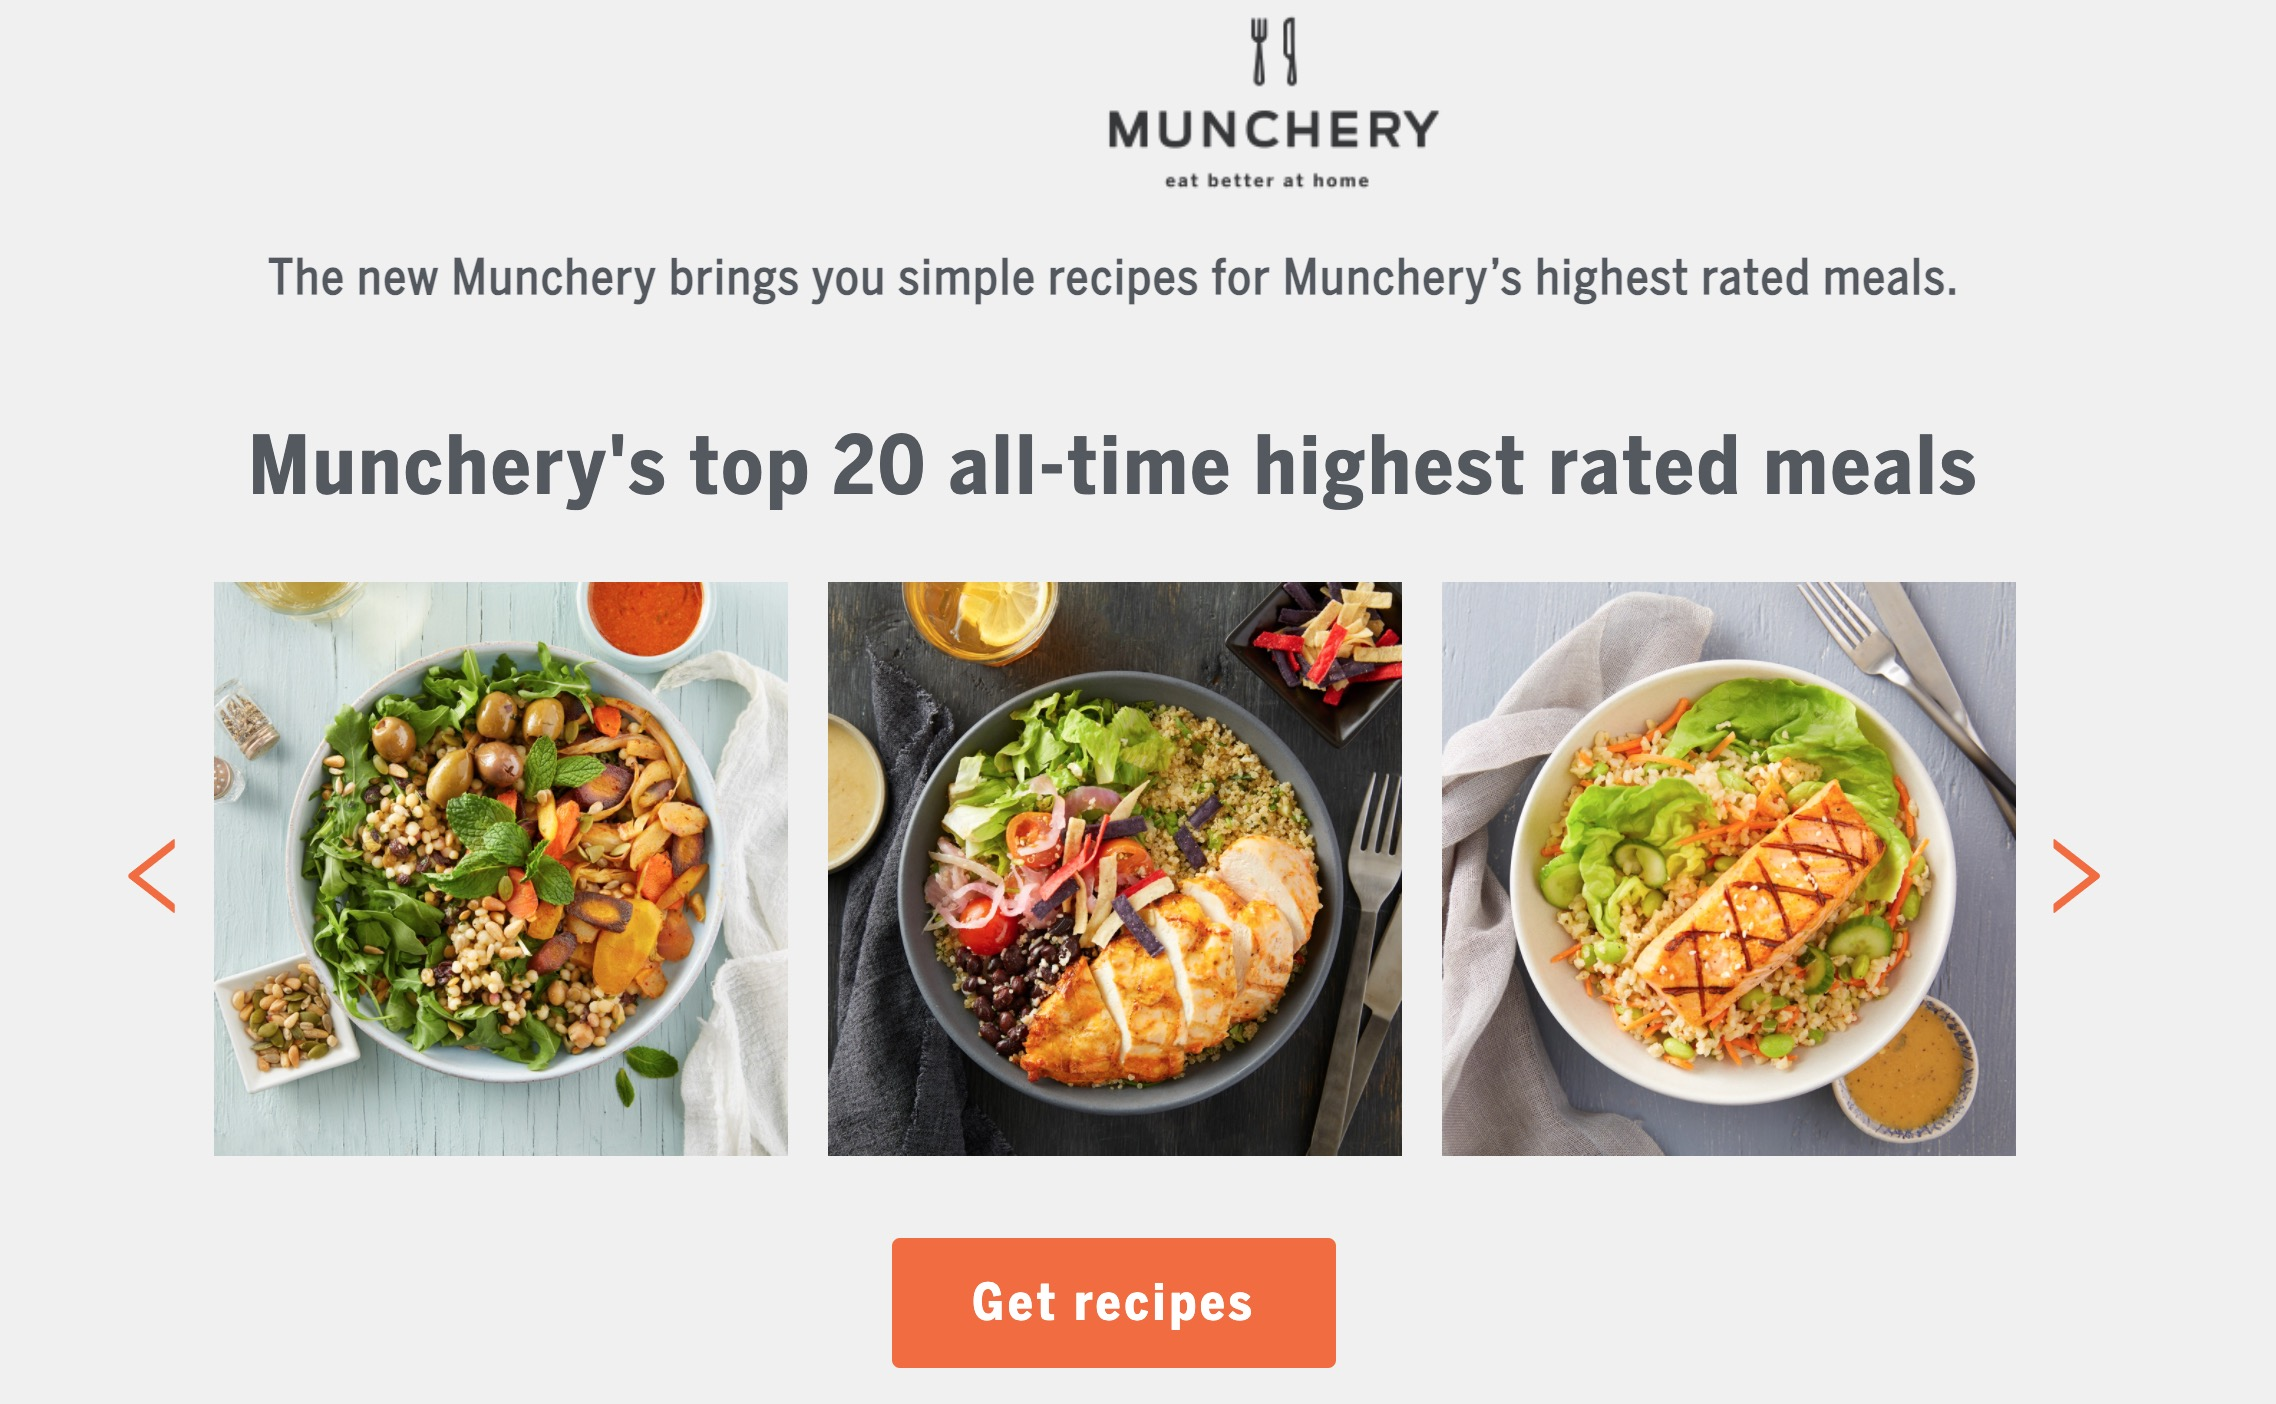 munchery top 20 recipes